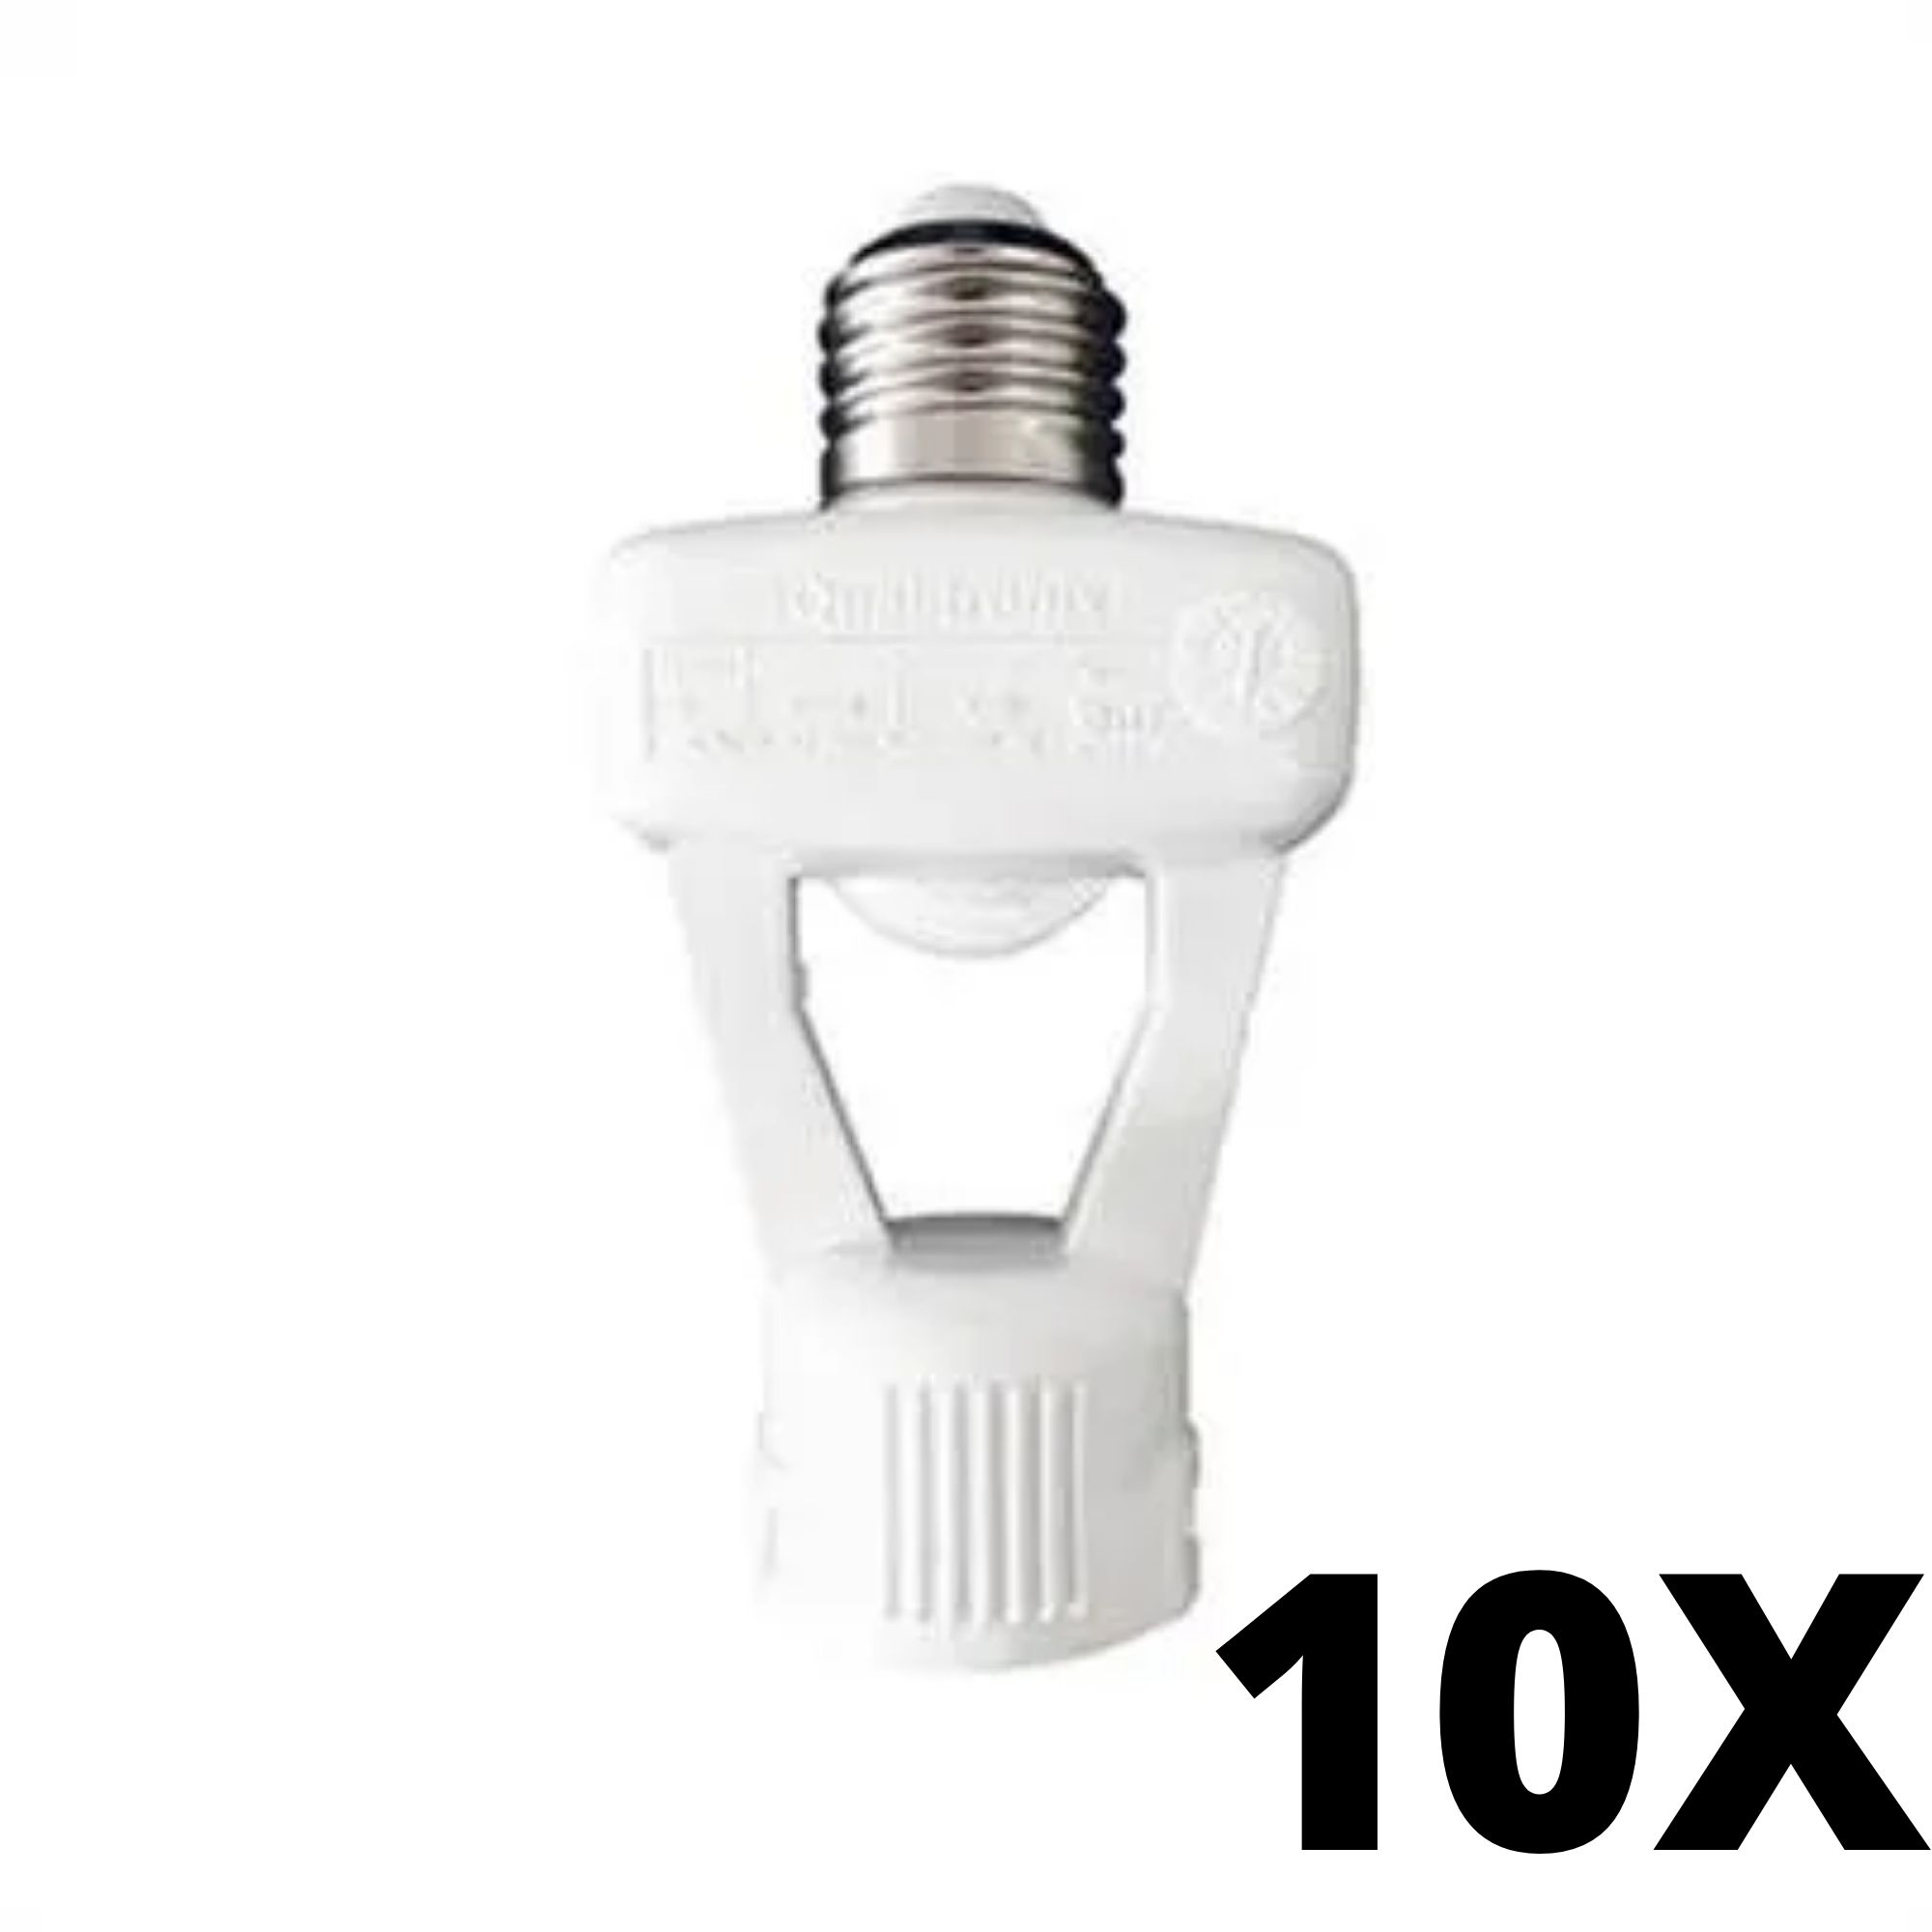 Kit 10 und Qualitronix Sensor de Presença Com Bocal Bivolt